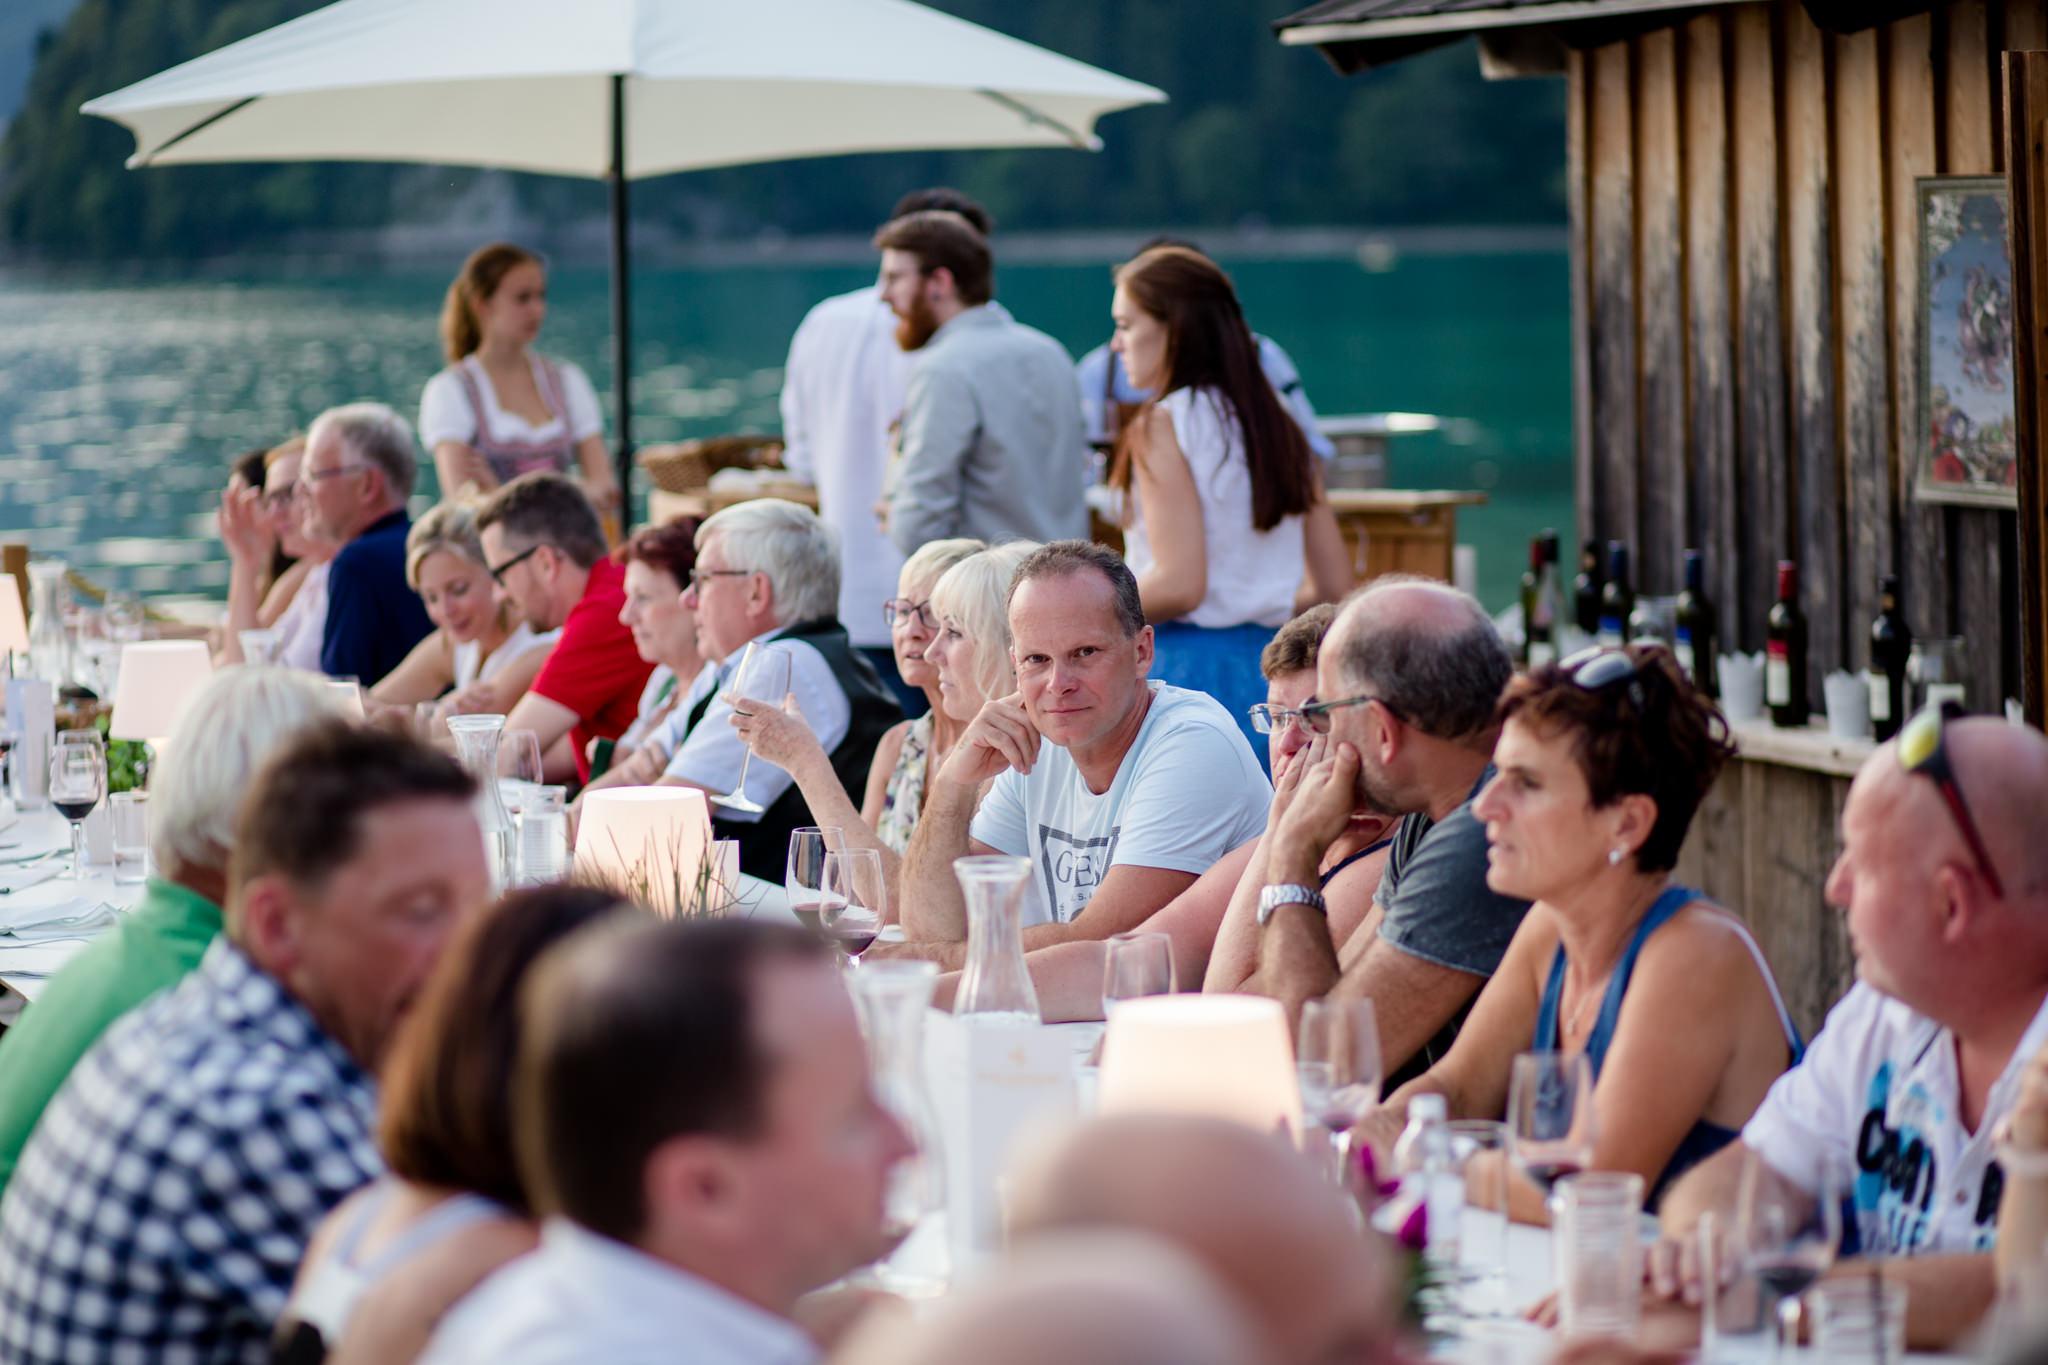 030-Wine-and-Dine-Wolfgangsee-Kirchenwirt-2019-Stefanie-Reindl-Photography-Web